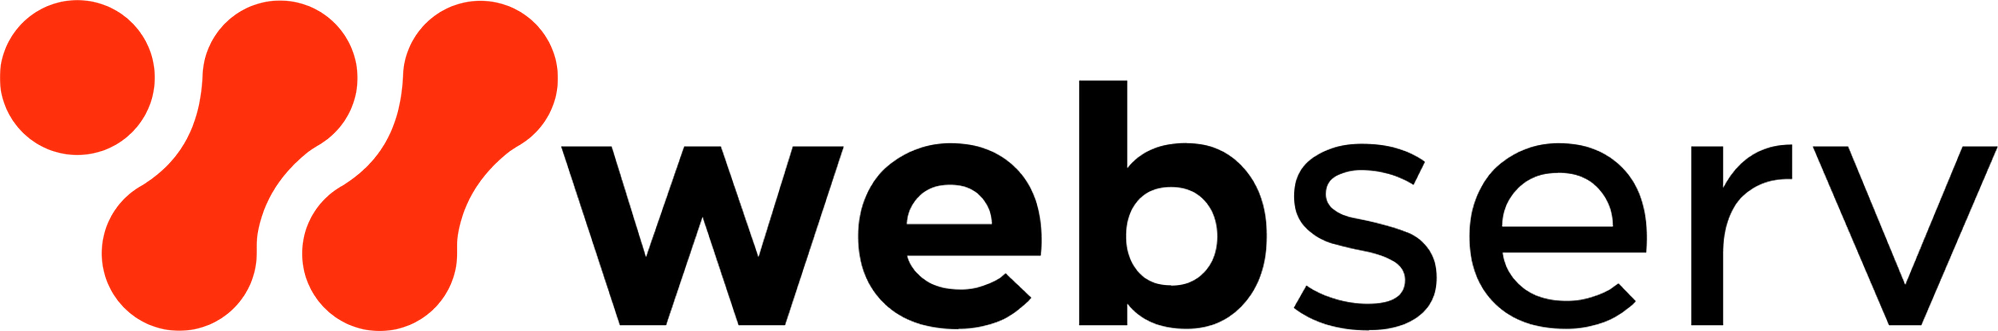 | webserv Logo High Resblk